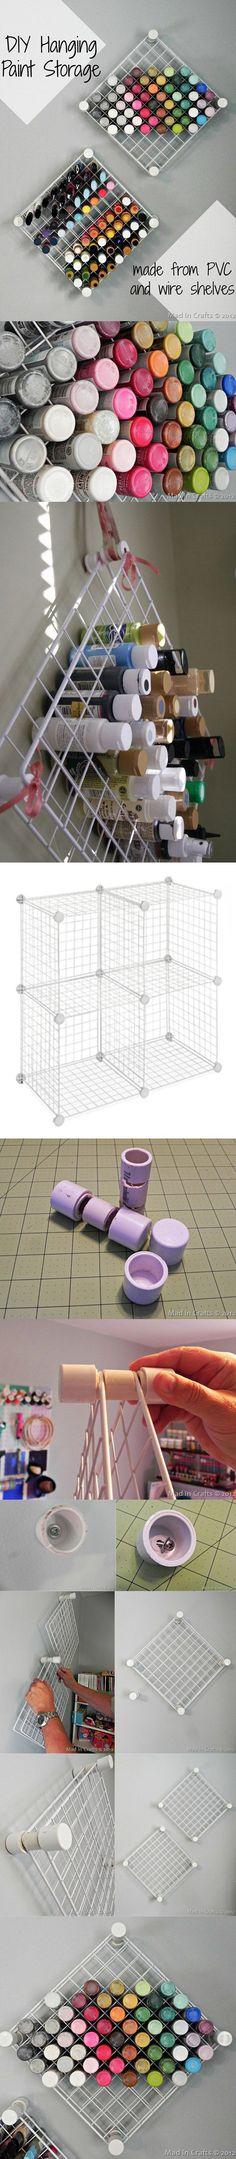 almacenador-estanteria-rejilla-diy-muy-ingenioso